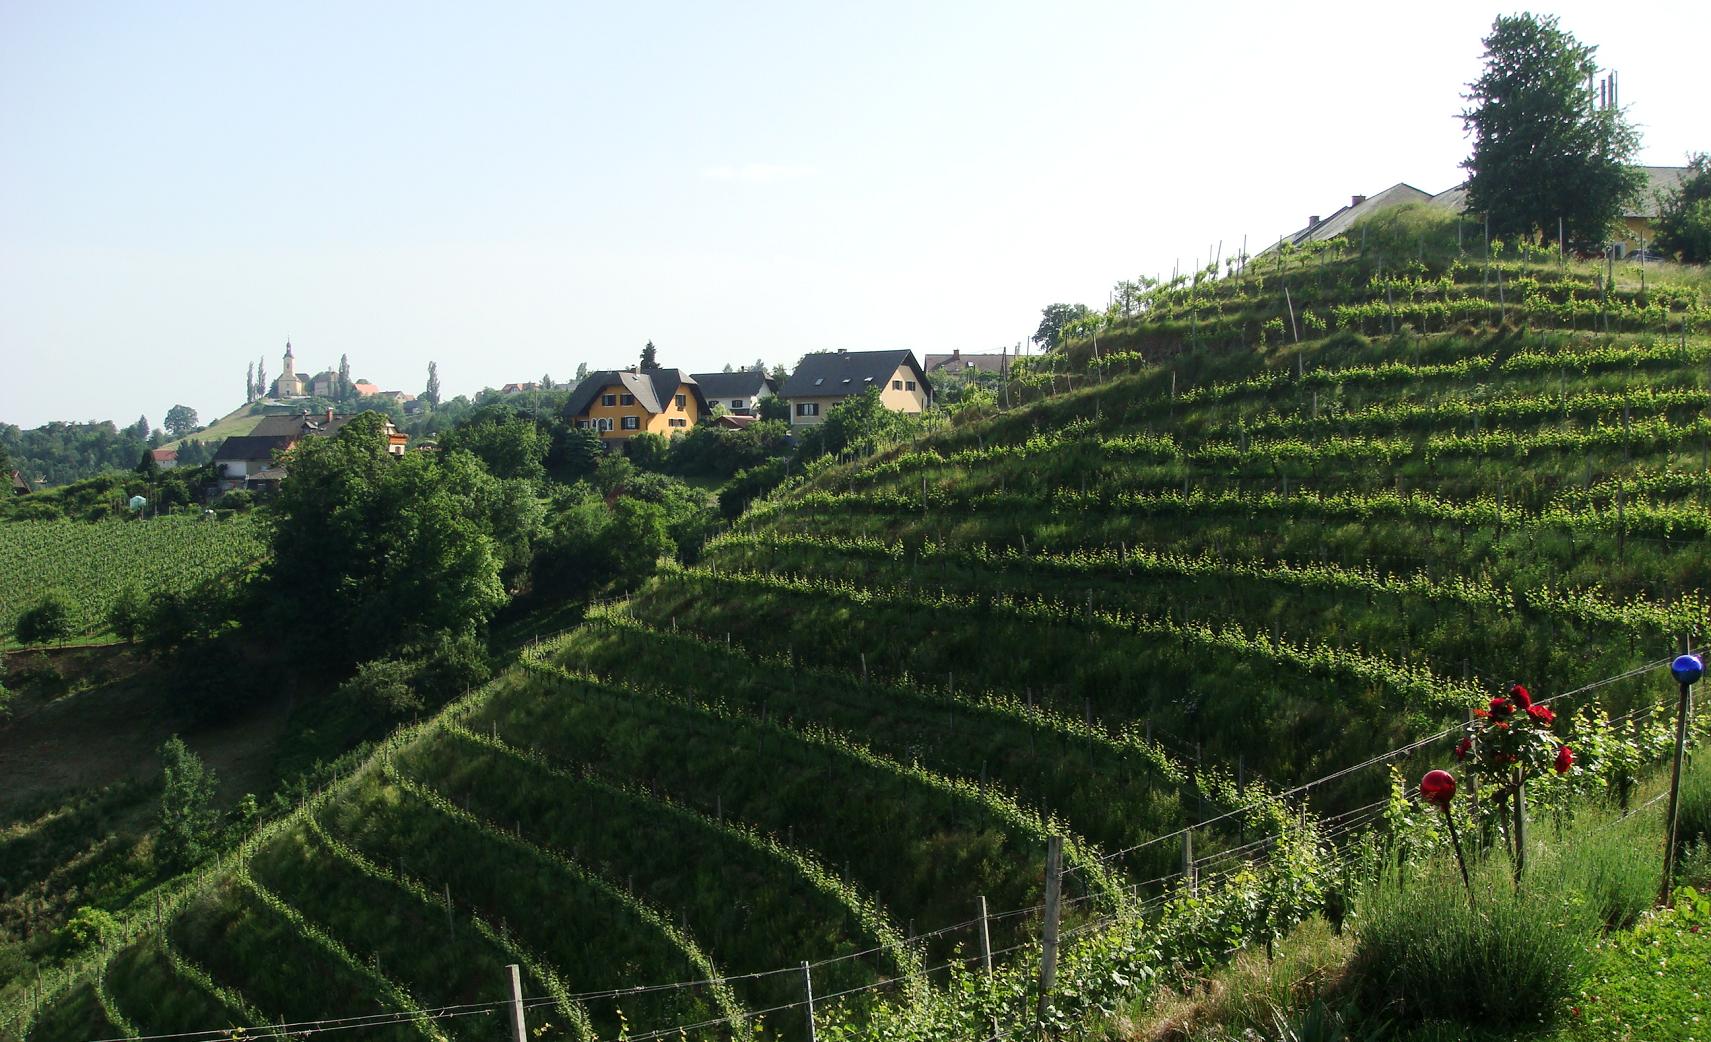 Albert winery - Kramer family - vineyard with winery building